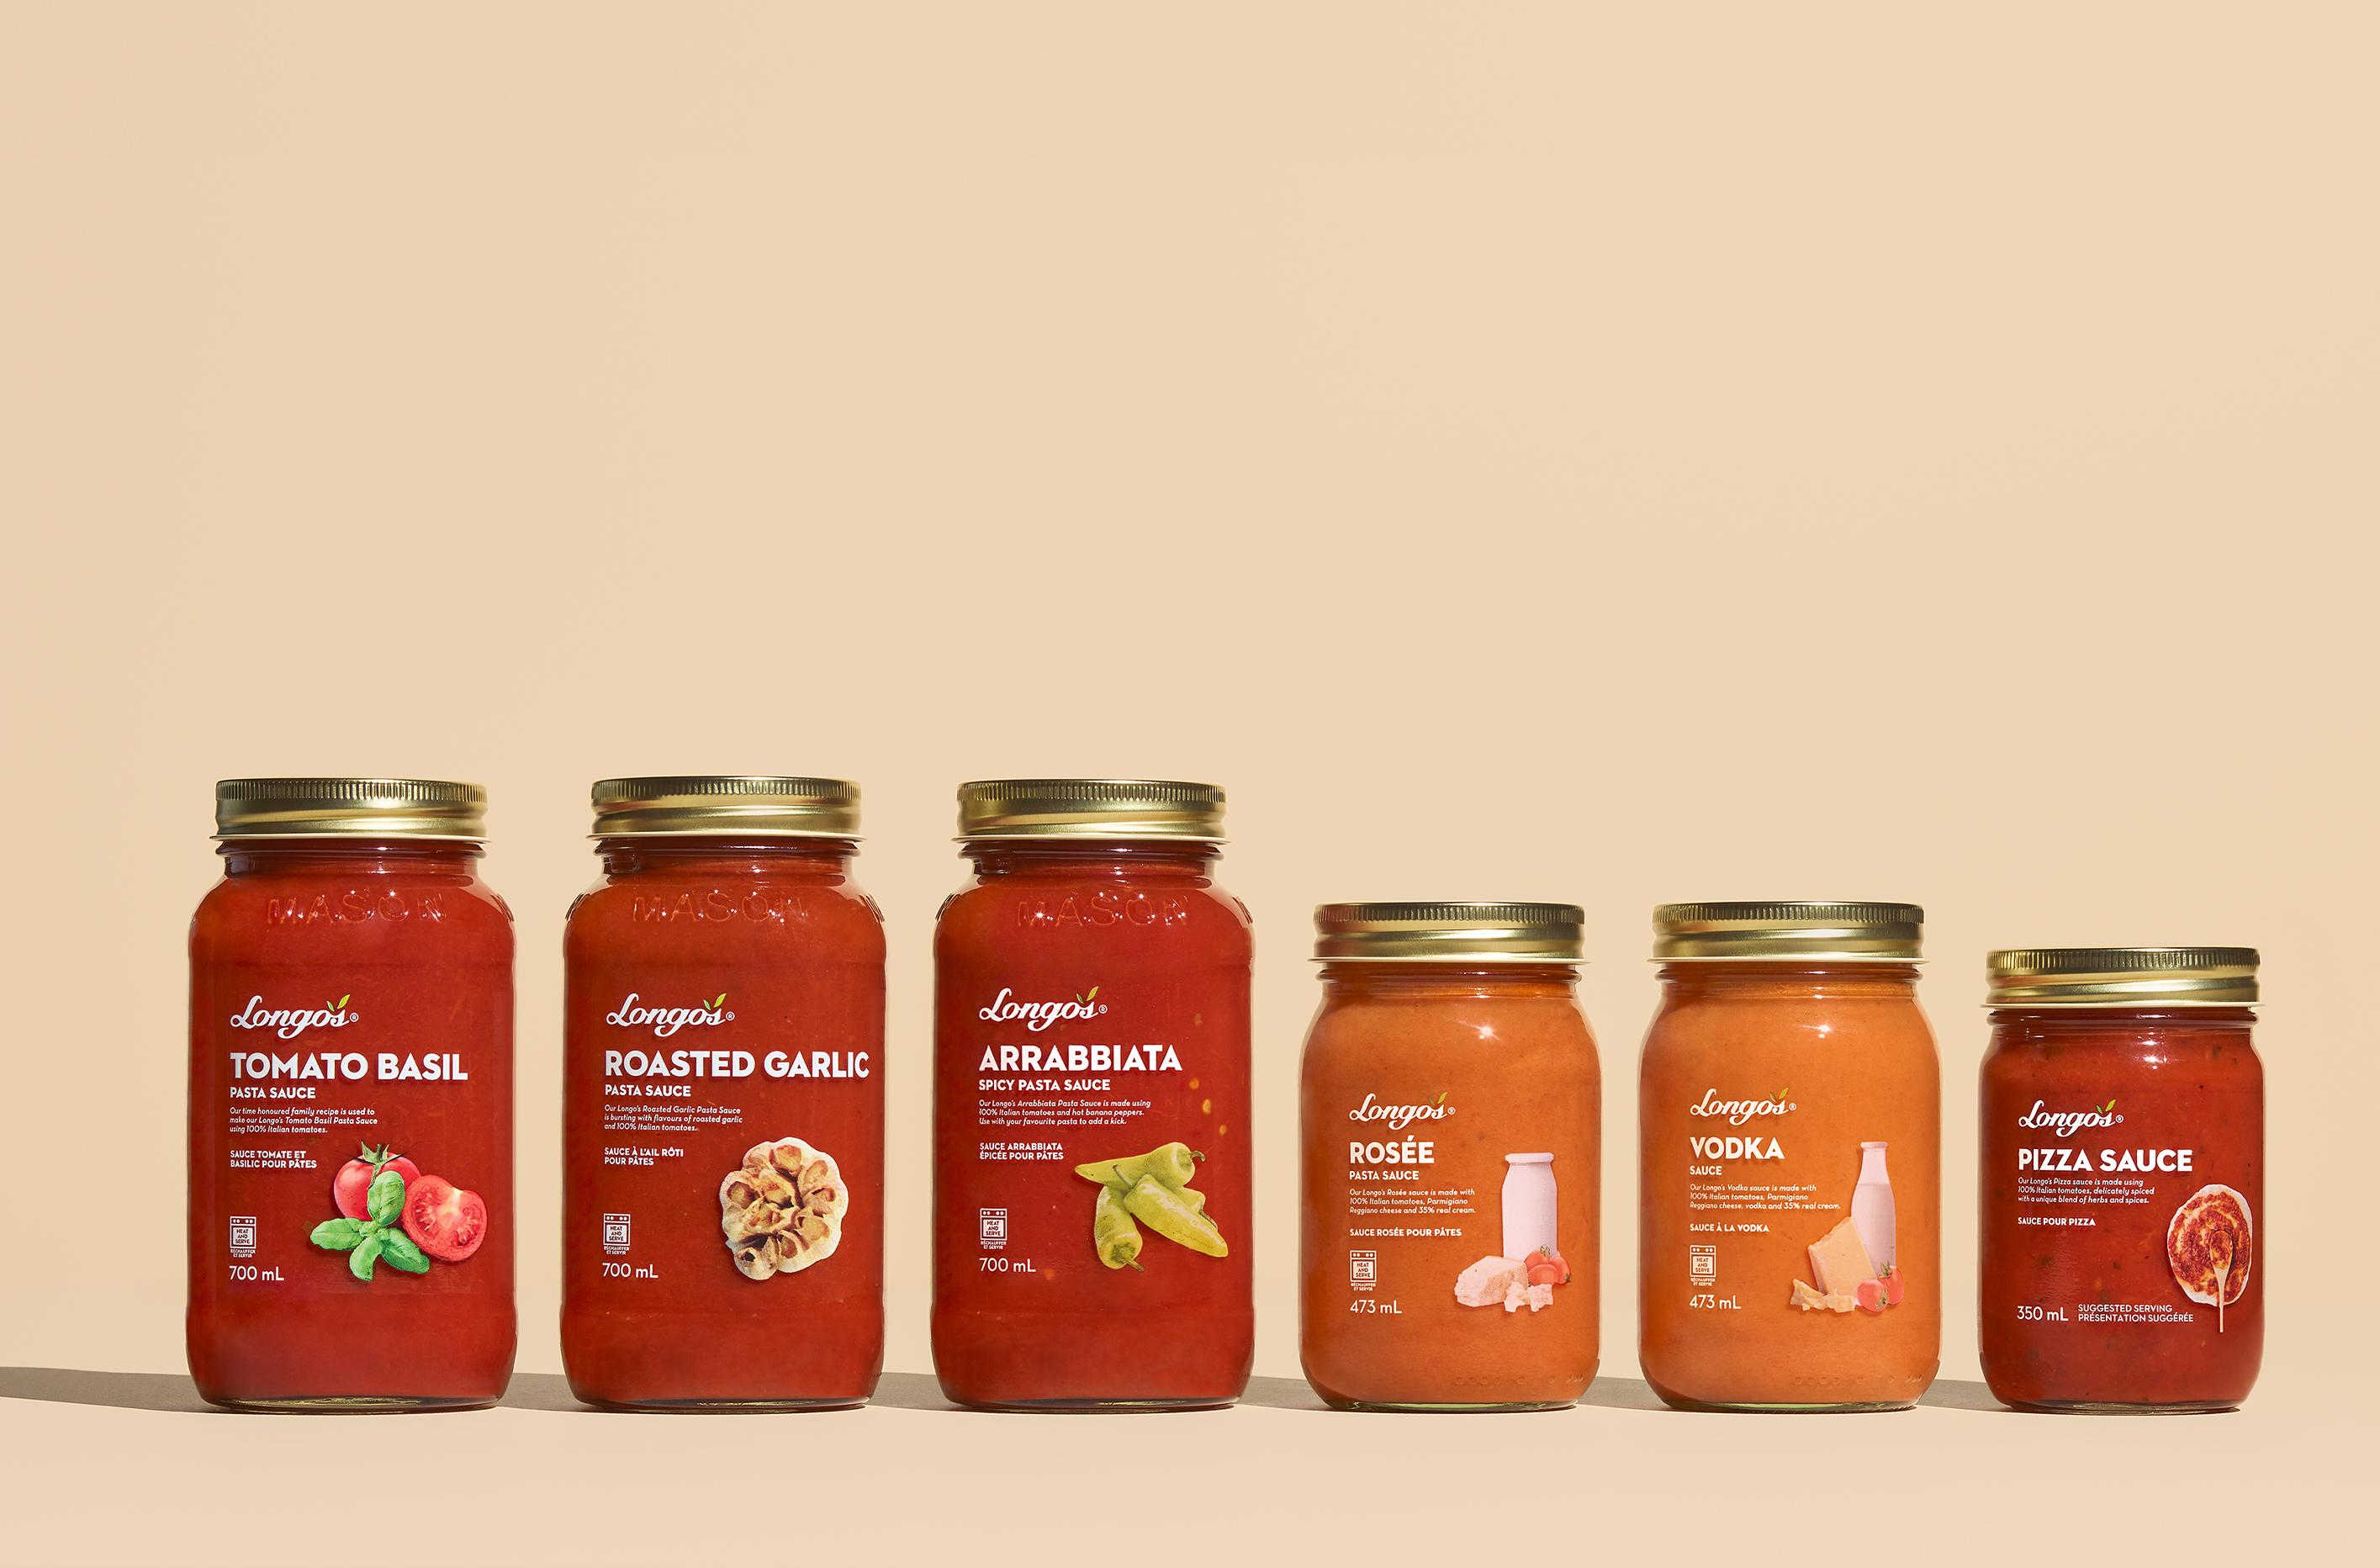 Longos-Private Label Sauces